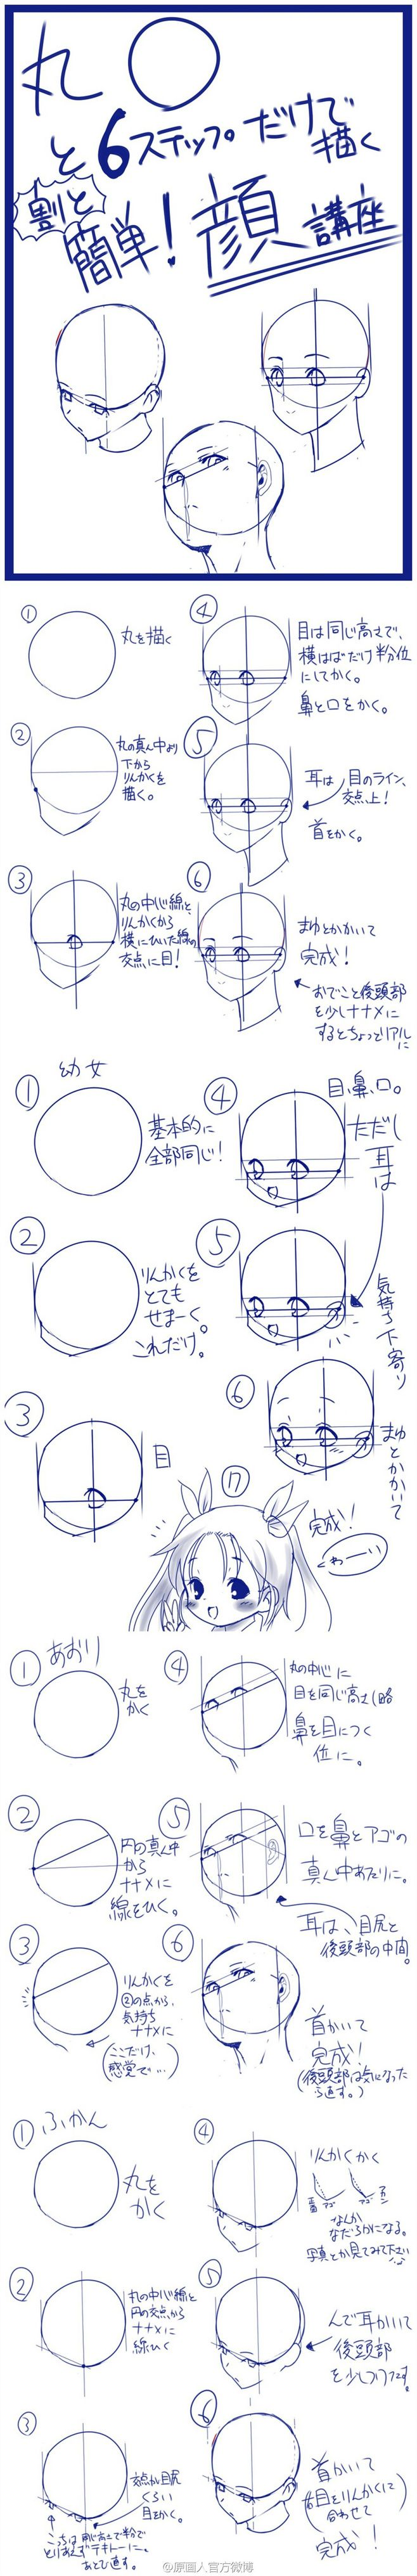 【P站教程】6个步骤画出3种常见角度的头...